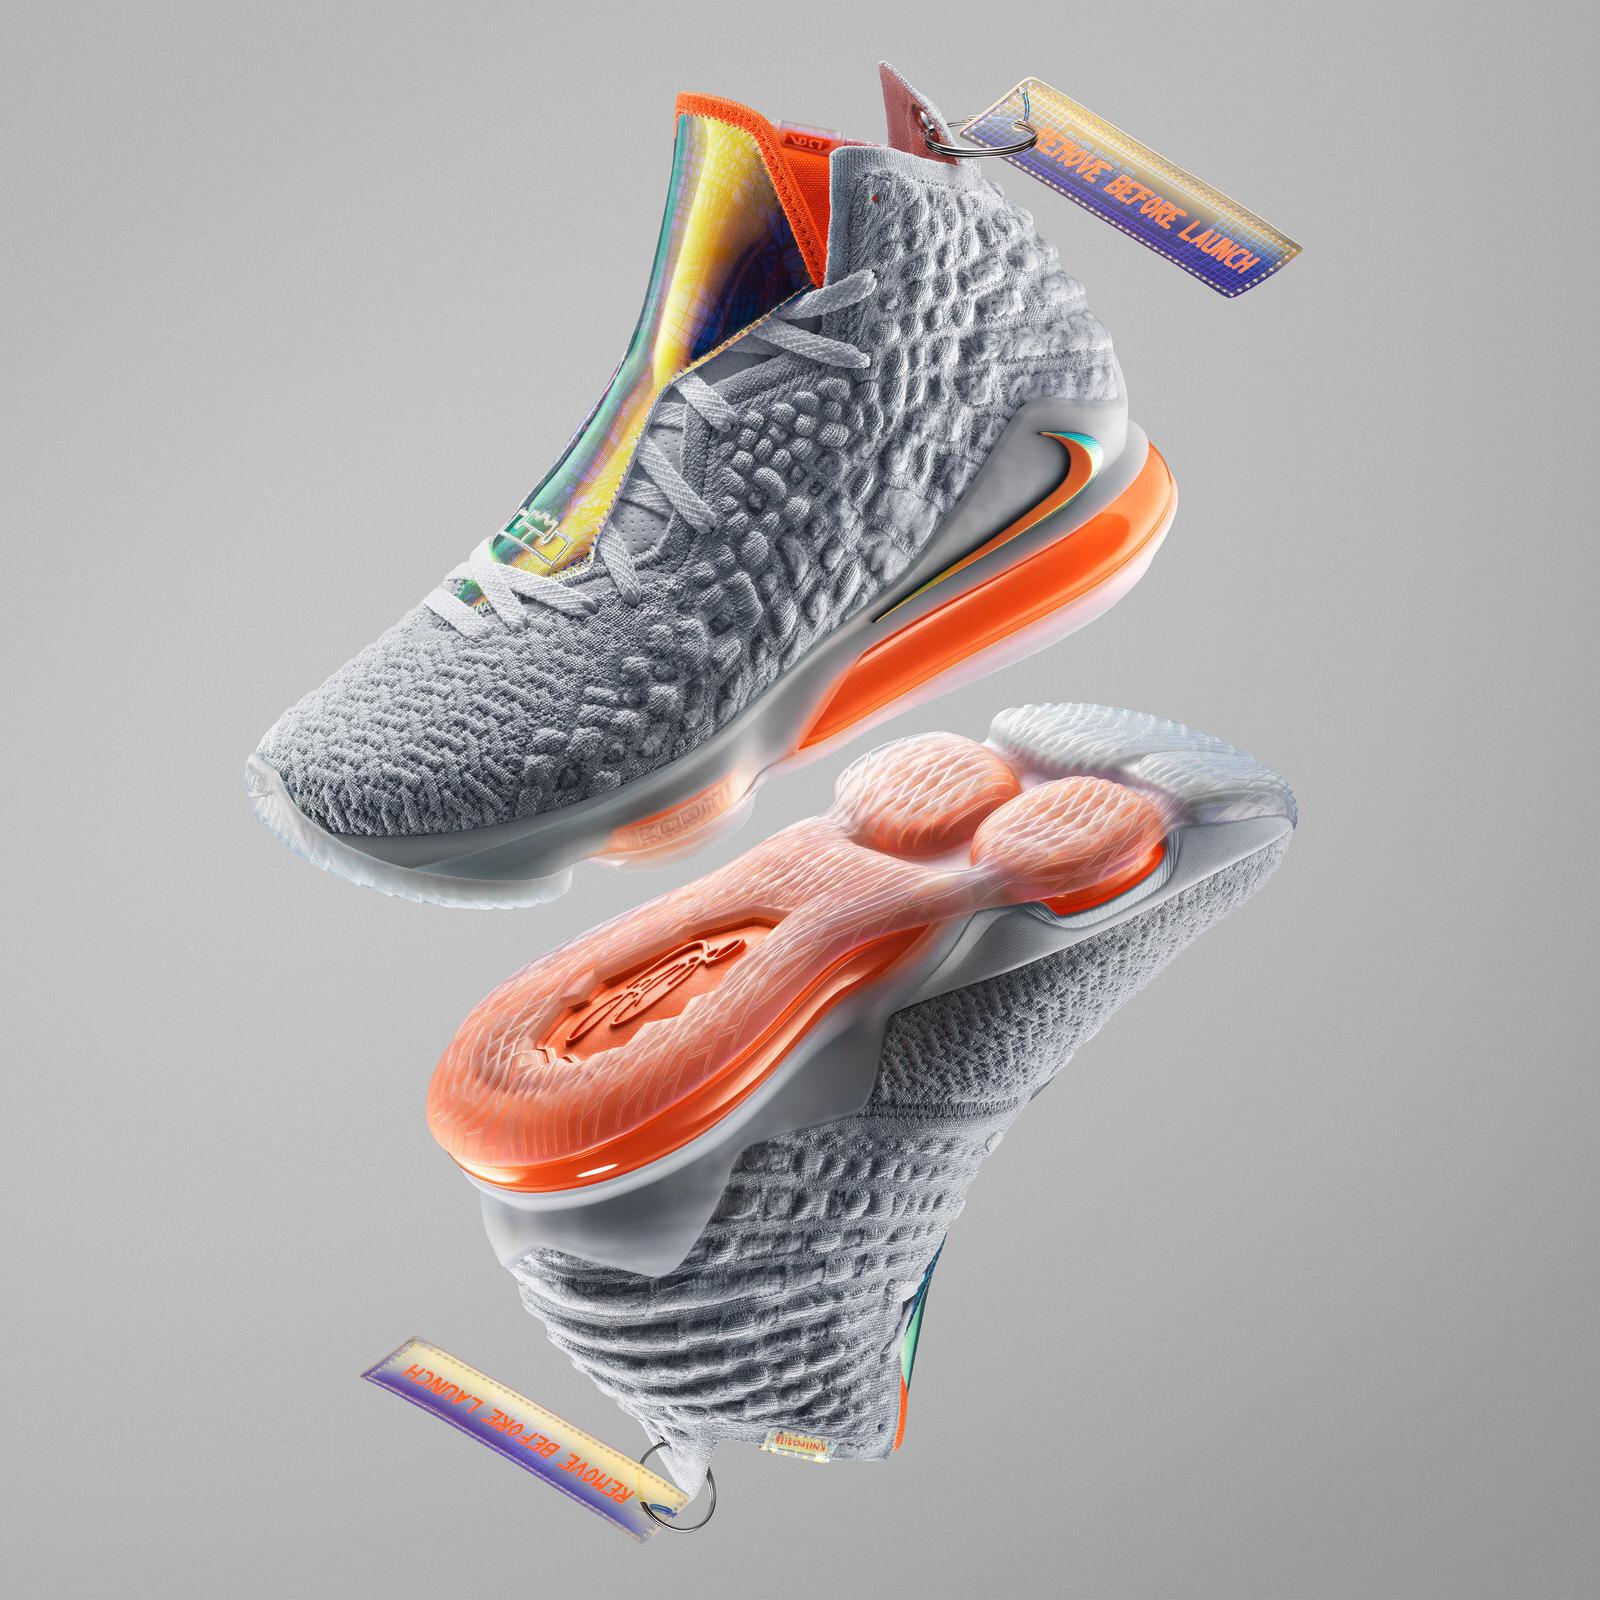 NikeNews_HO19_BB_LeBron17_FutureAir_Hero_V3_90322.jpg